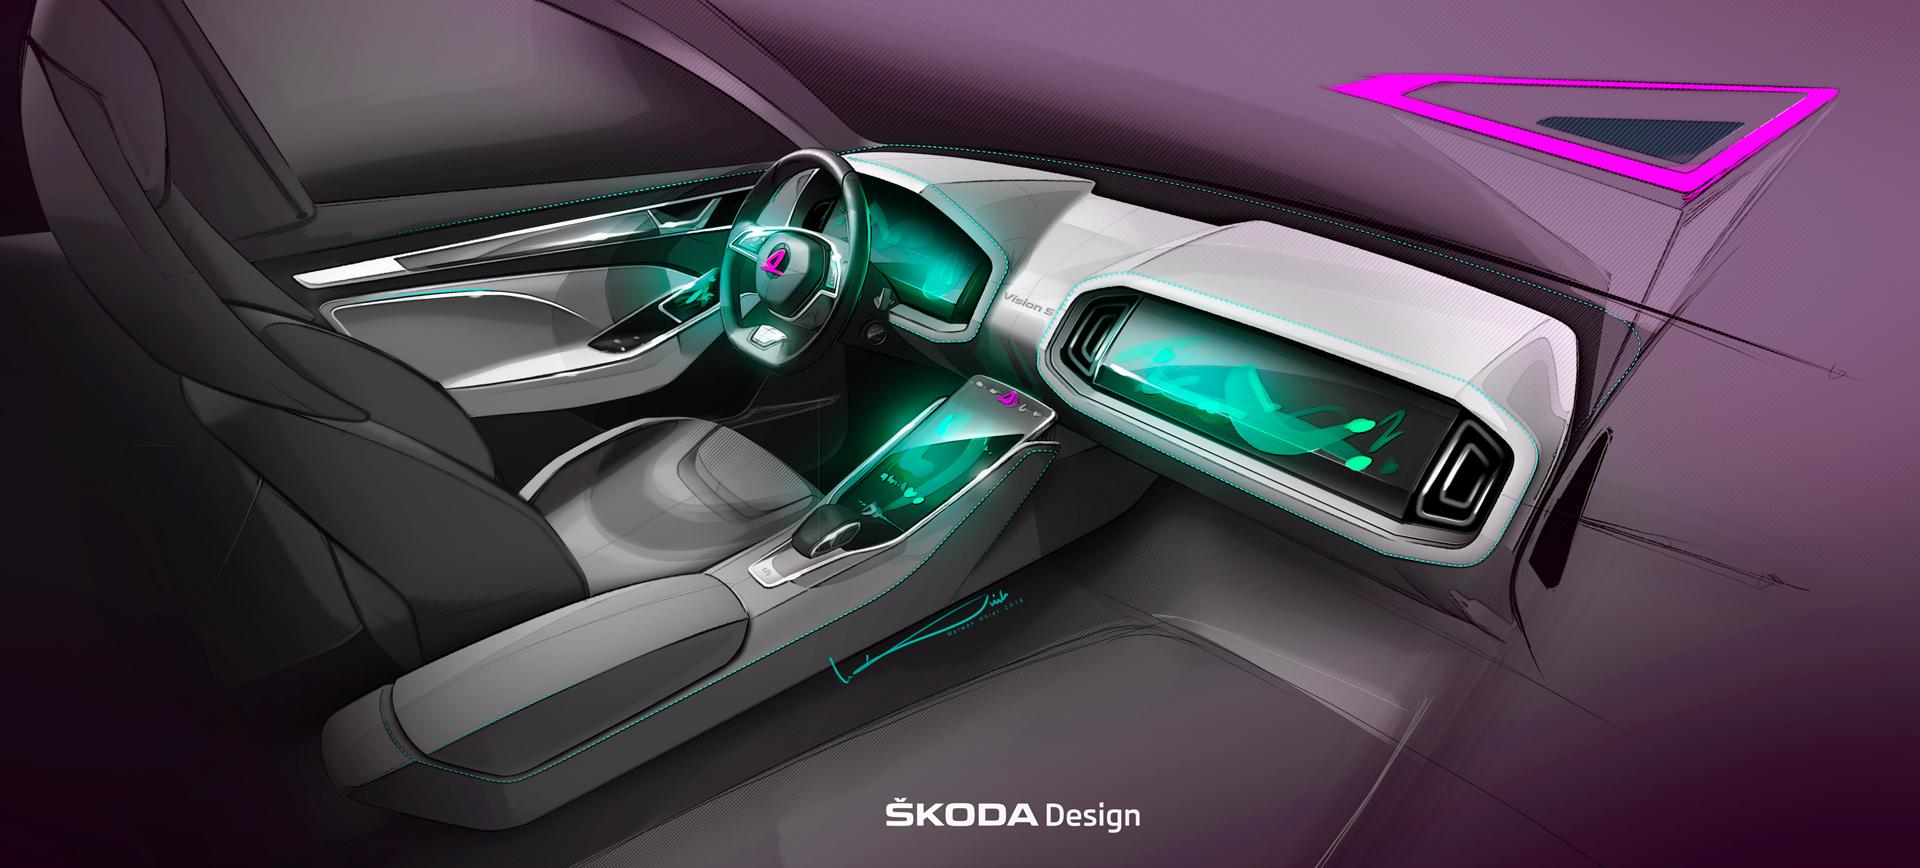 2016 skoda visions concepts for Interior visions designs